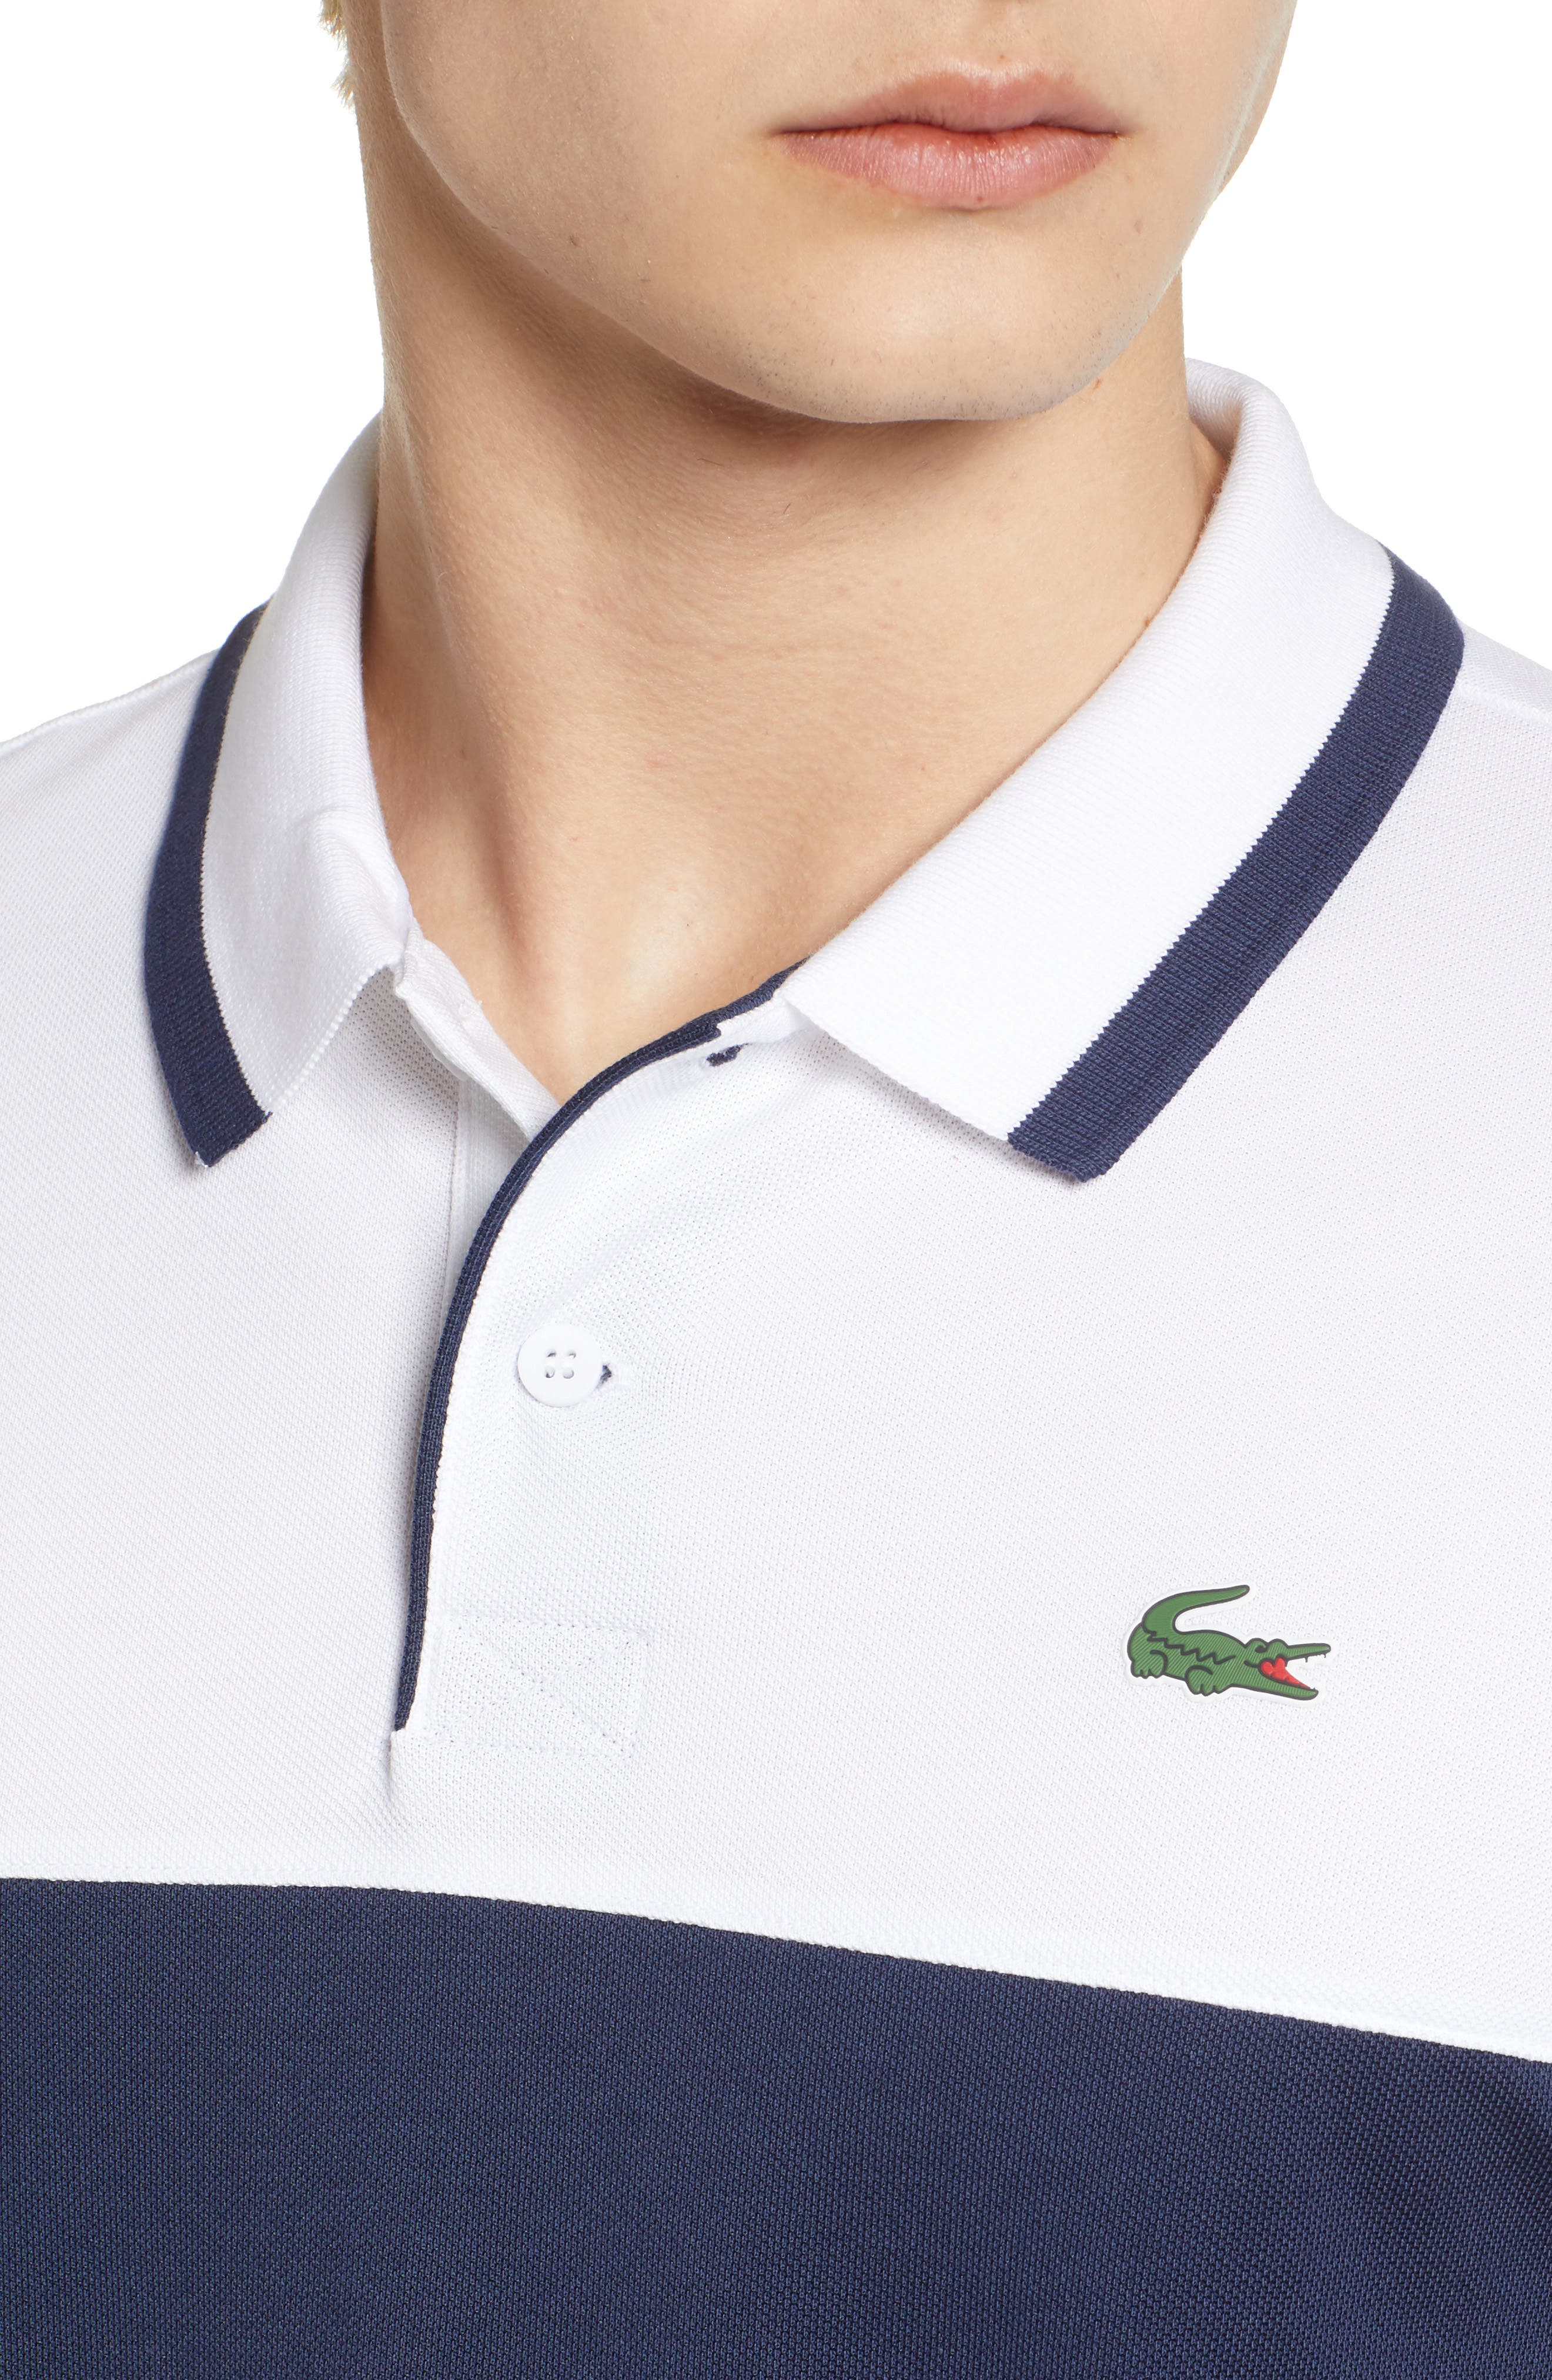 Piqué Cotton Blend Polo,                             Alternate thumbnail 4, color,                             White/ Navy Blue